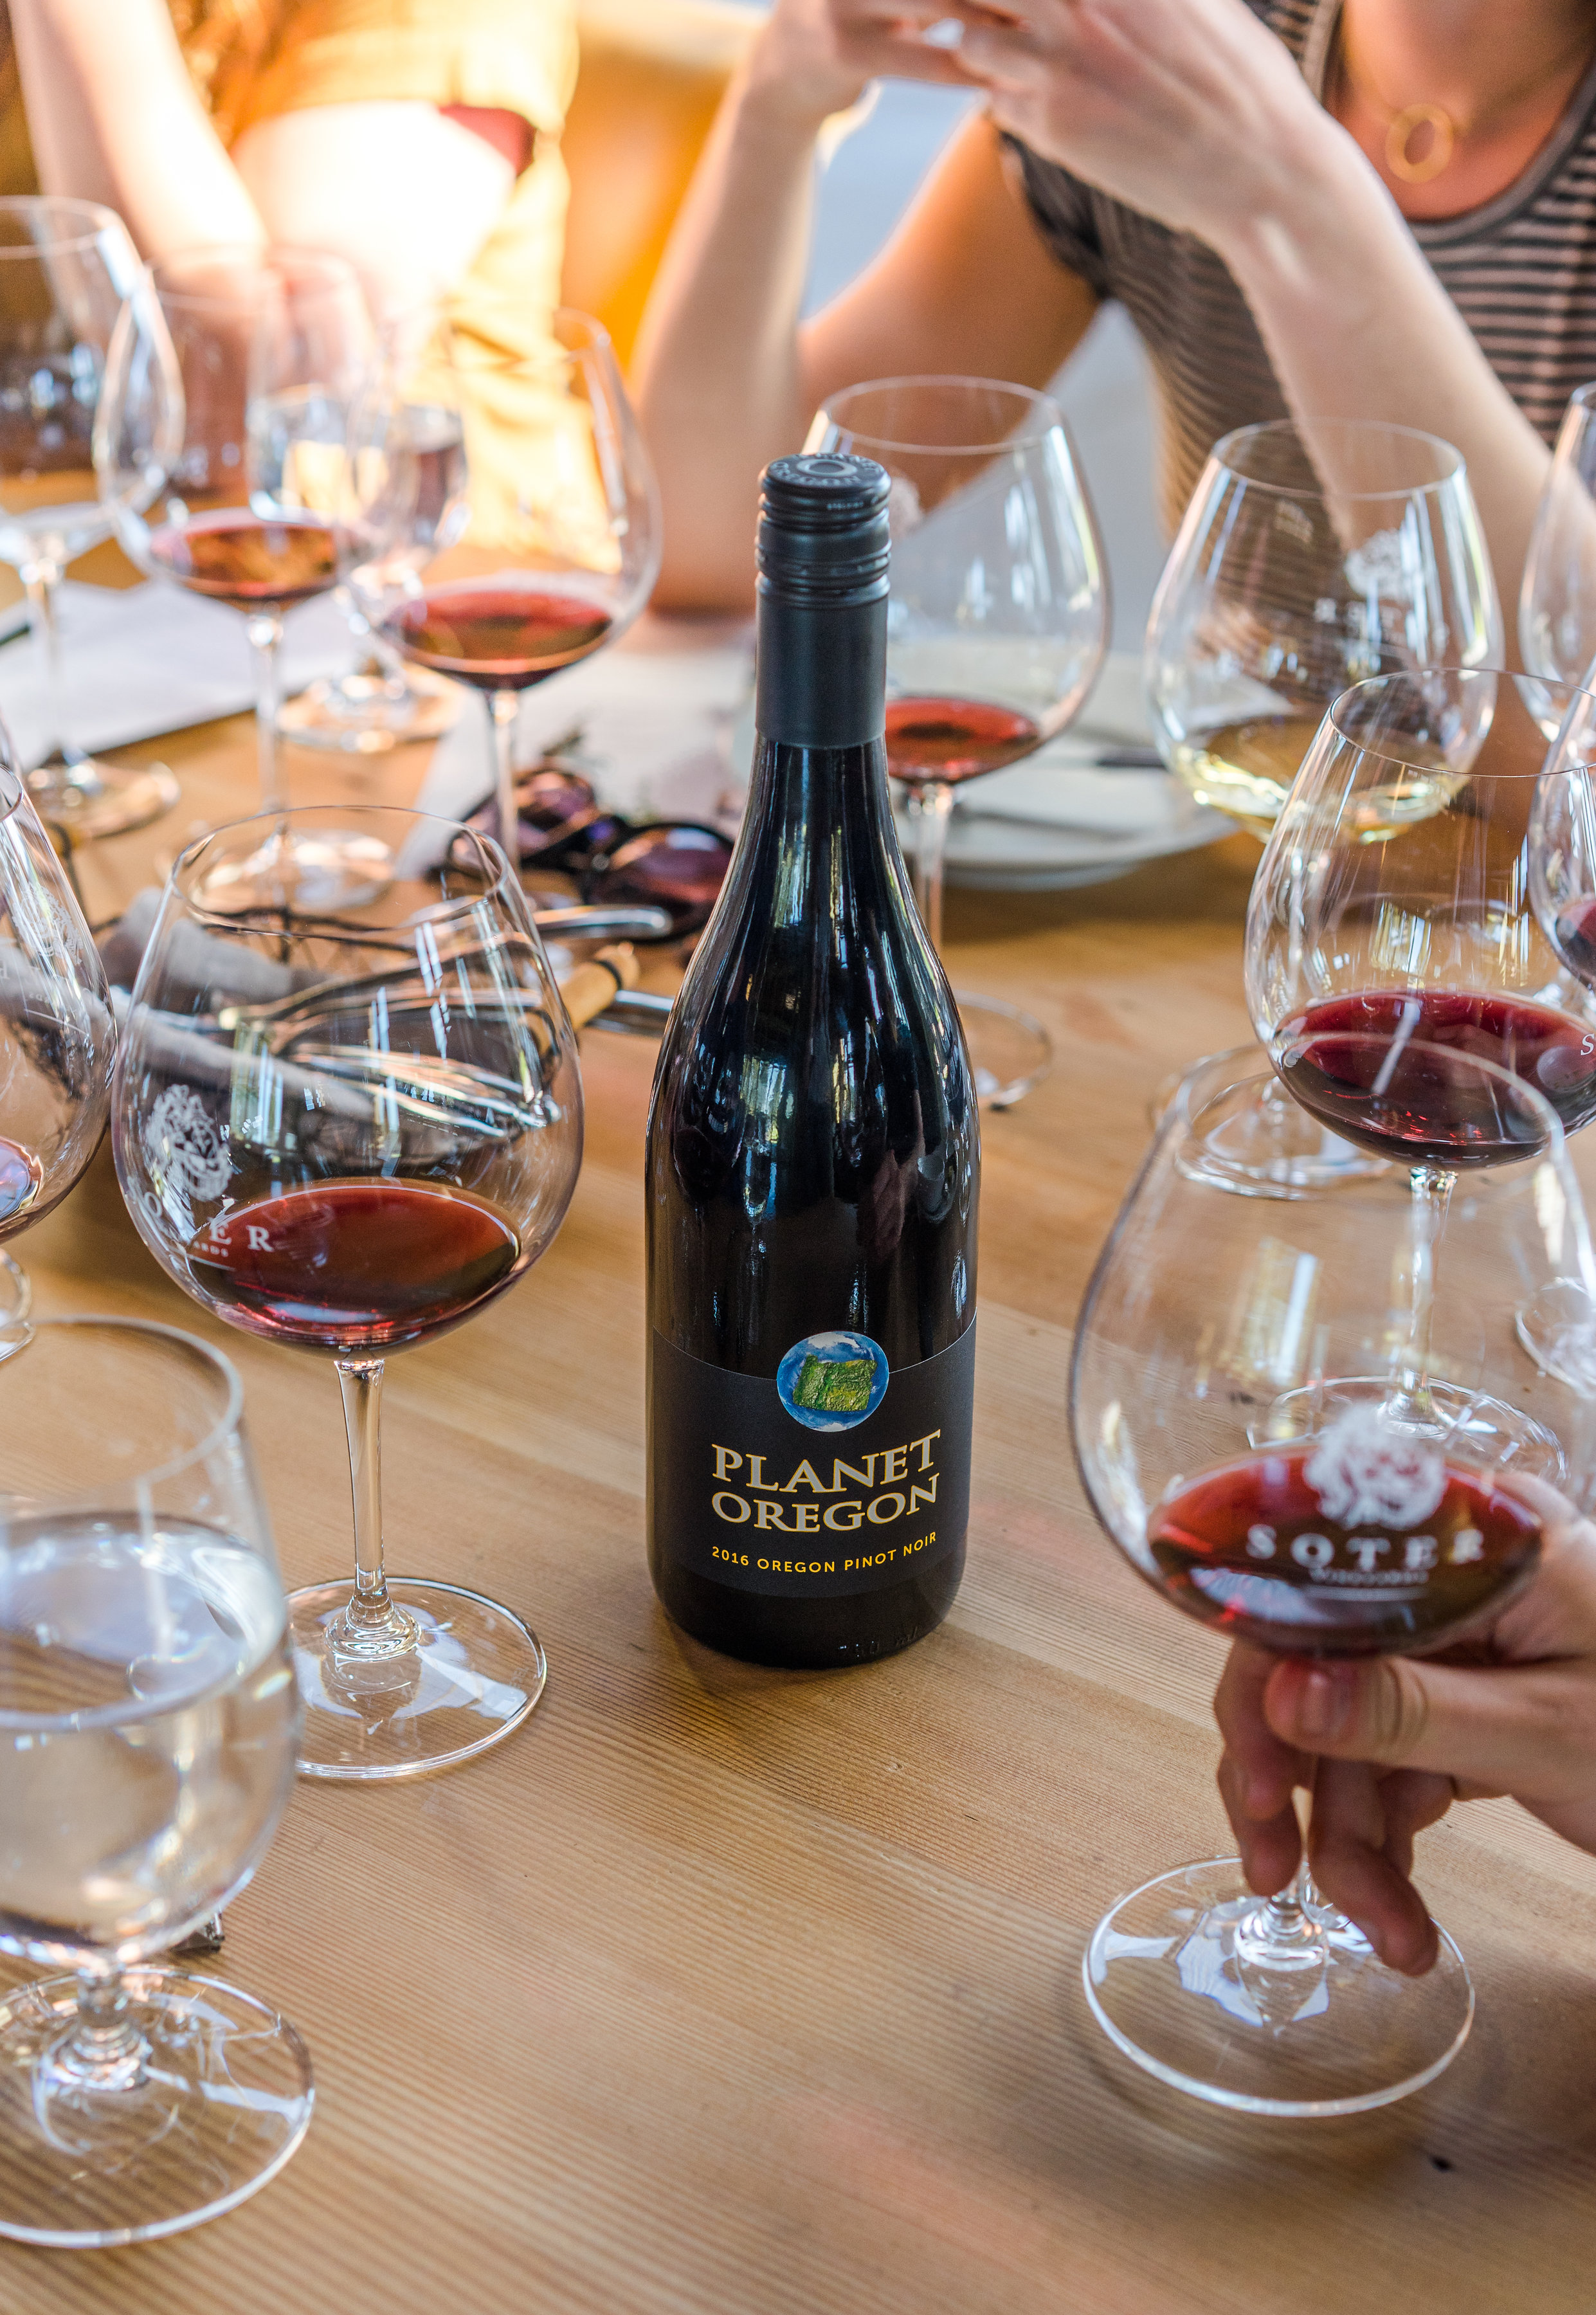 Soter tasting Luscious Porcelain planet oregon wine 2018 McSwain.JPG